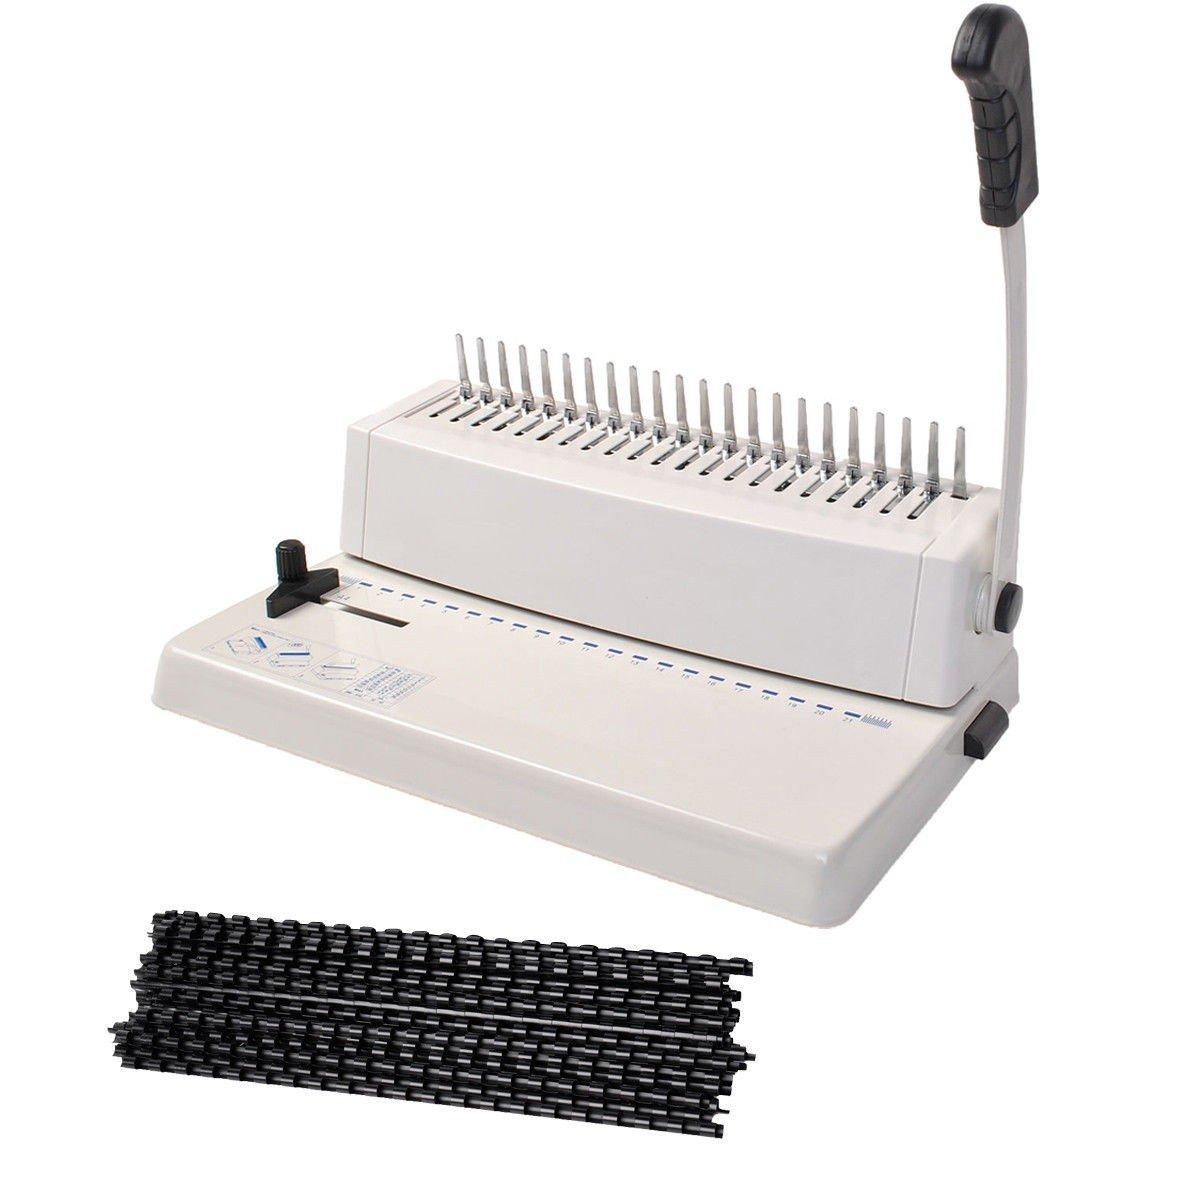 21-Hole 250 Sheets Paper Comb Punch Binder Binding Machine Scrapbook w/200 Combs